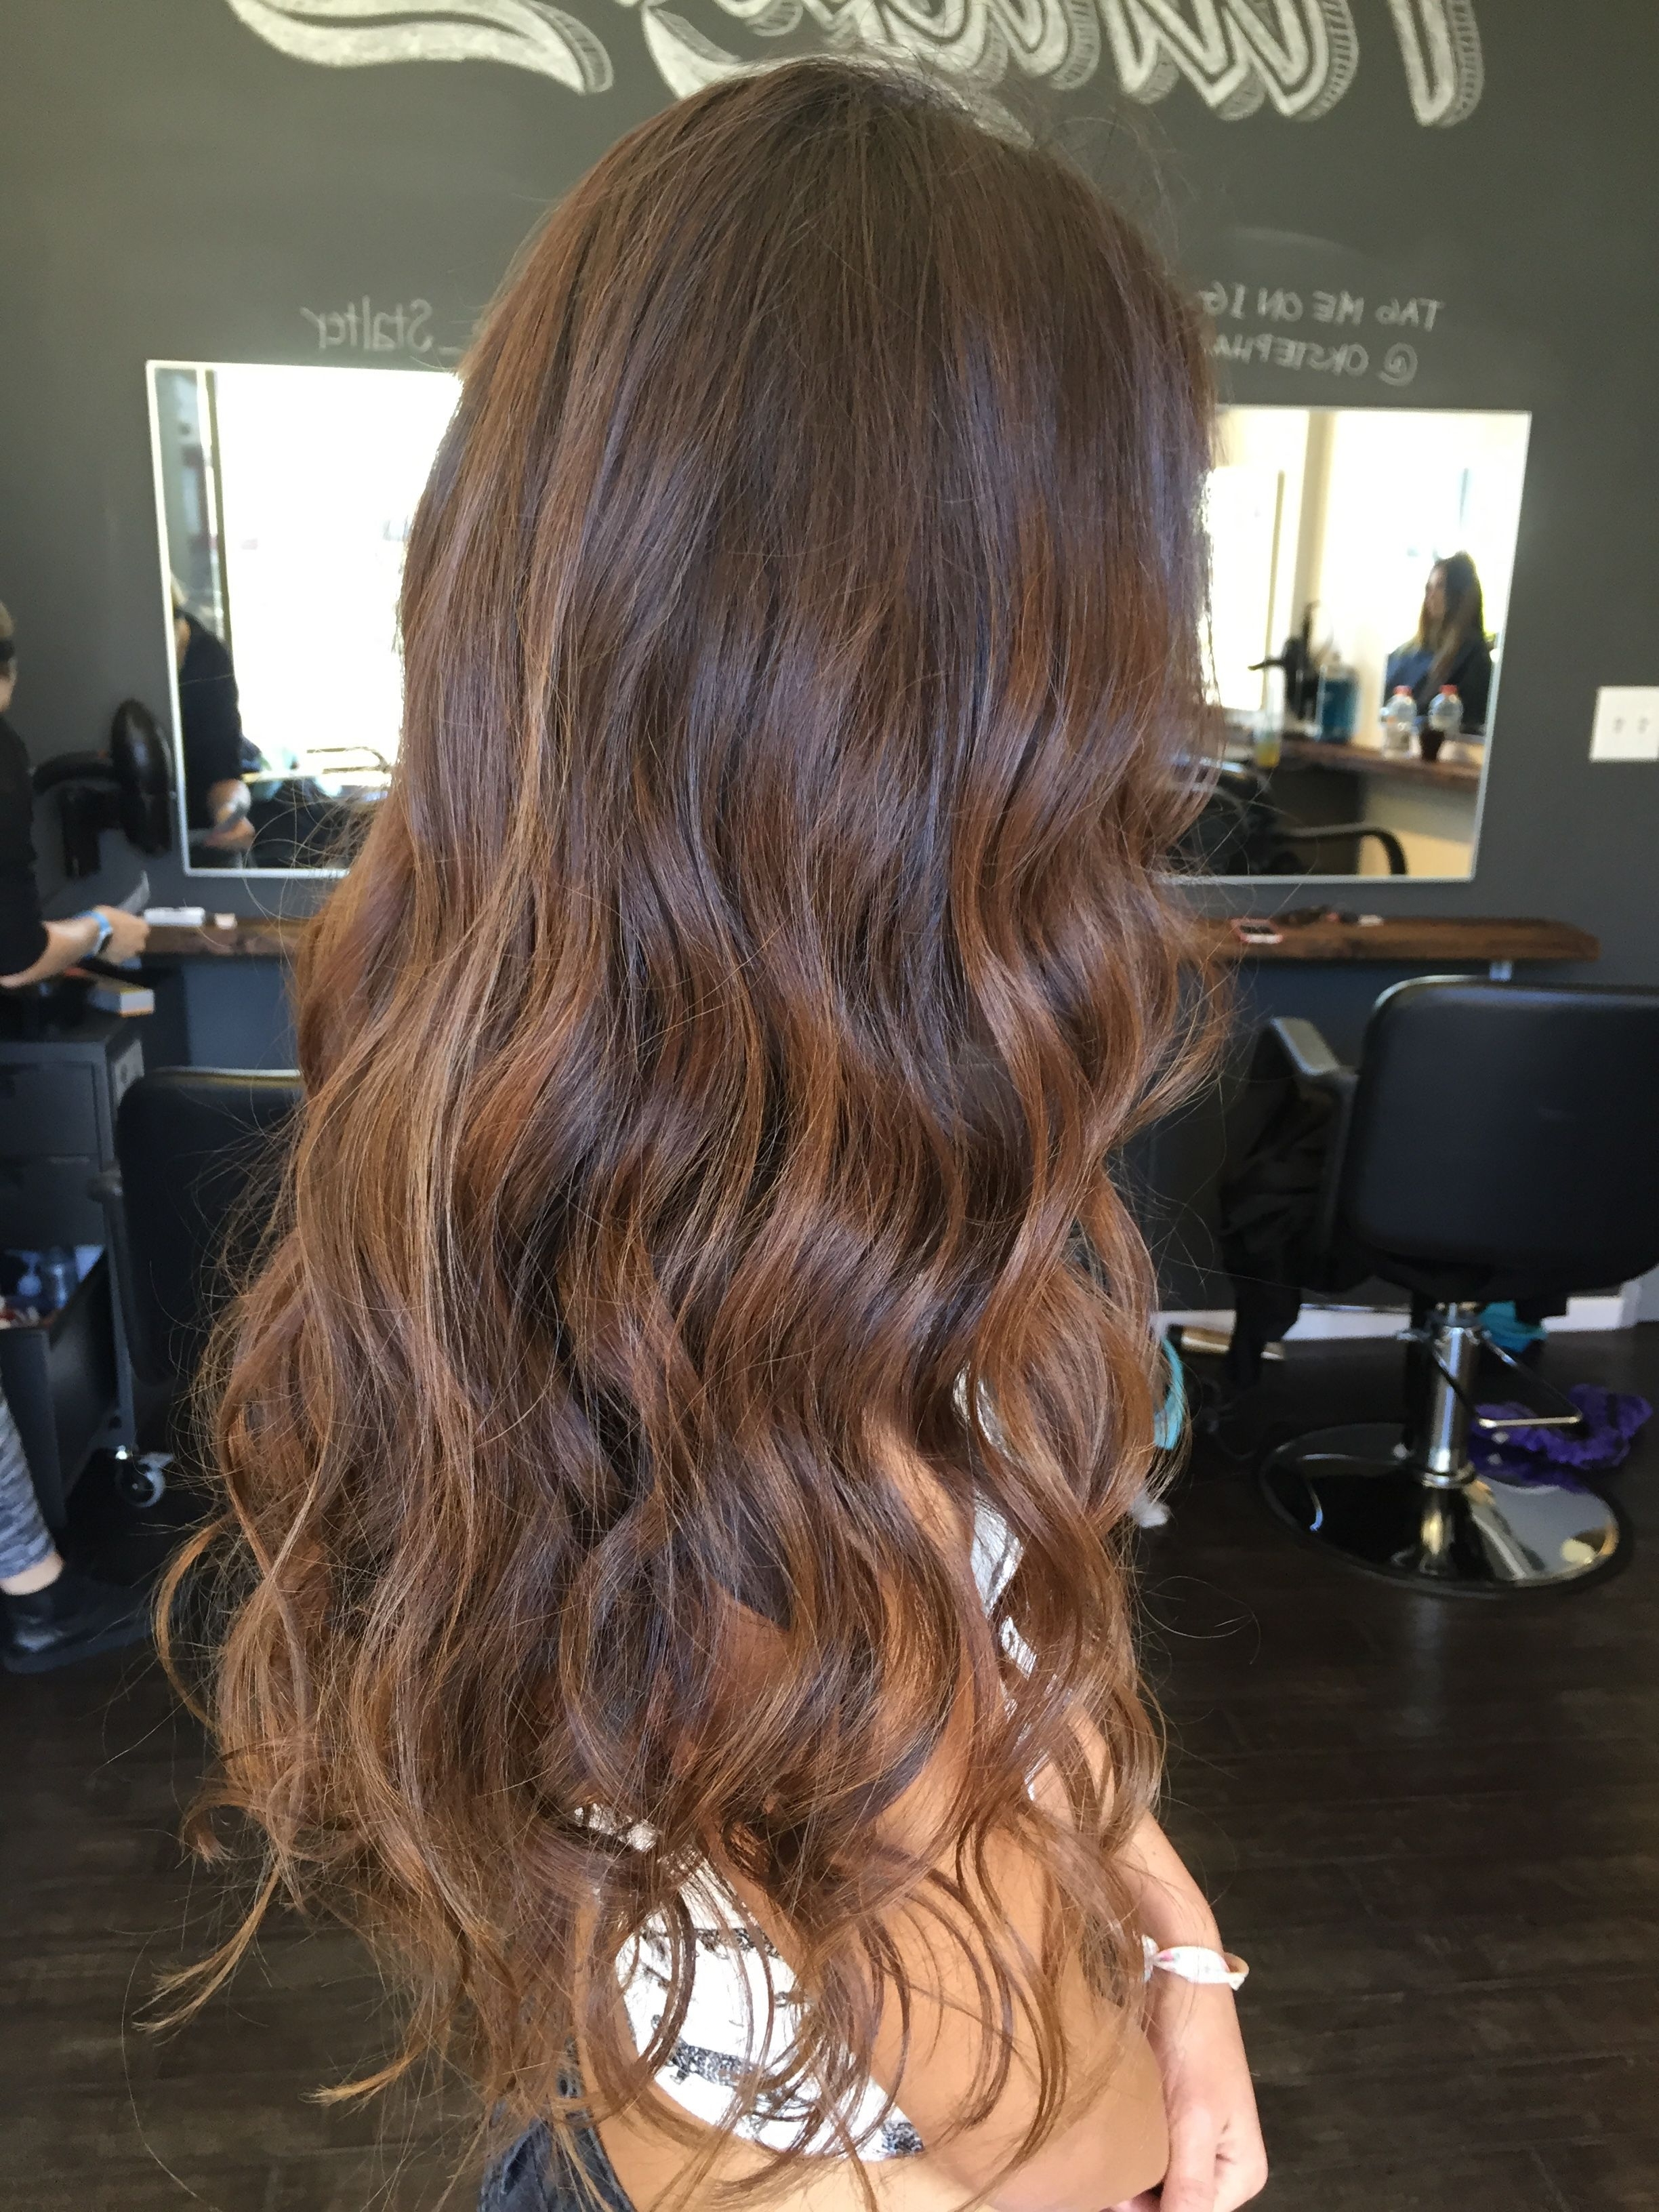 Long Surfer Girl Hair (View 14 of 20)